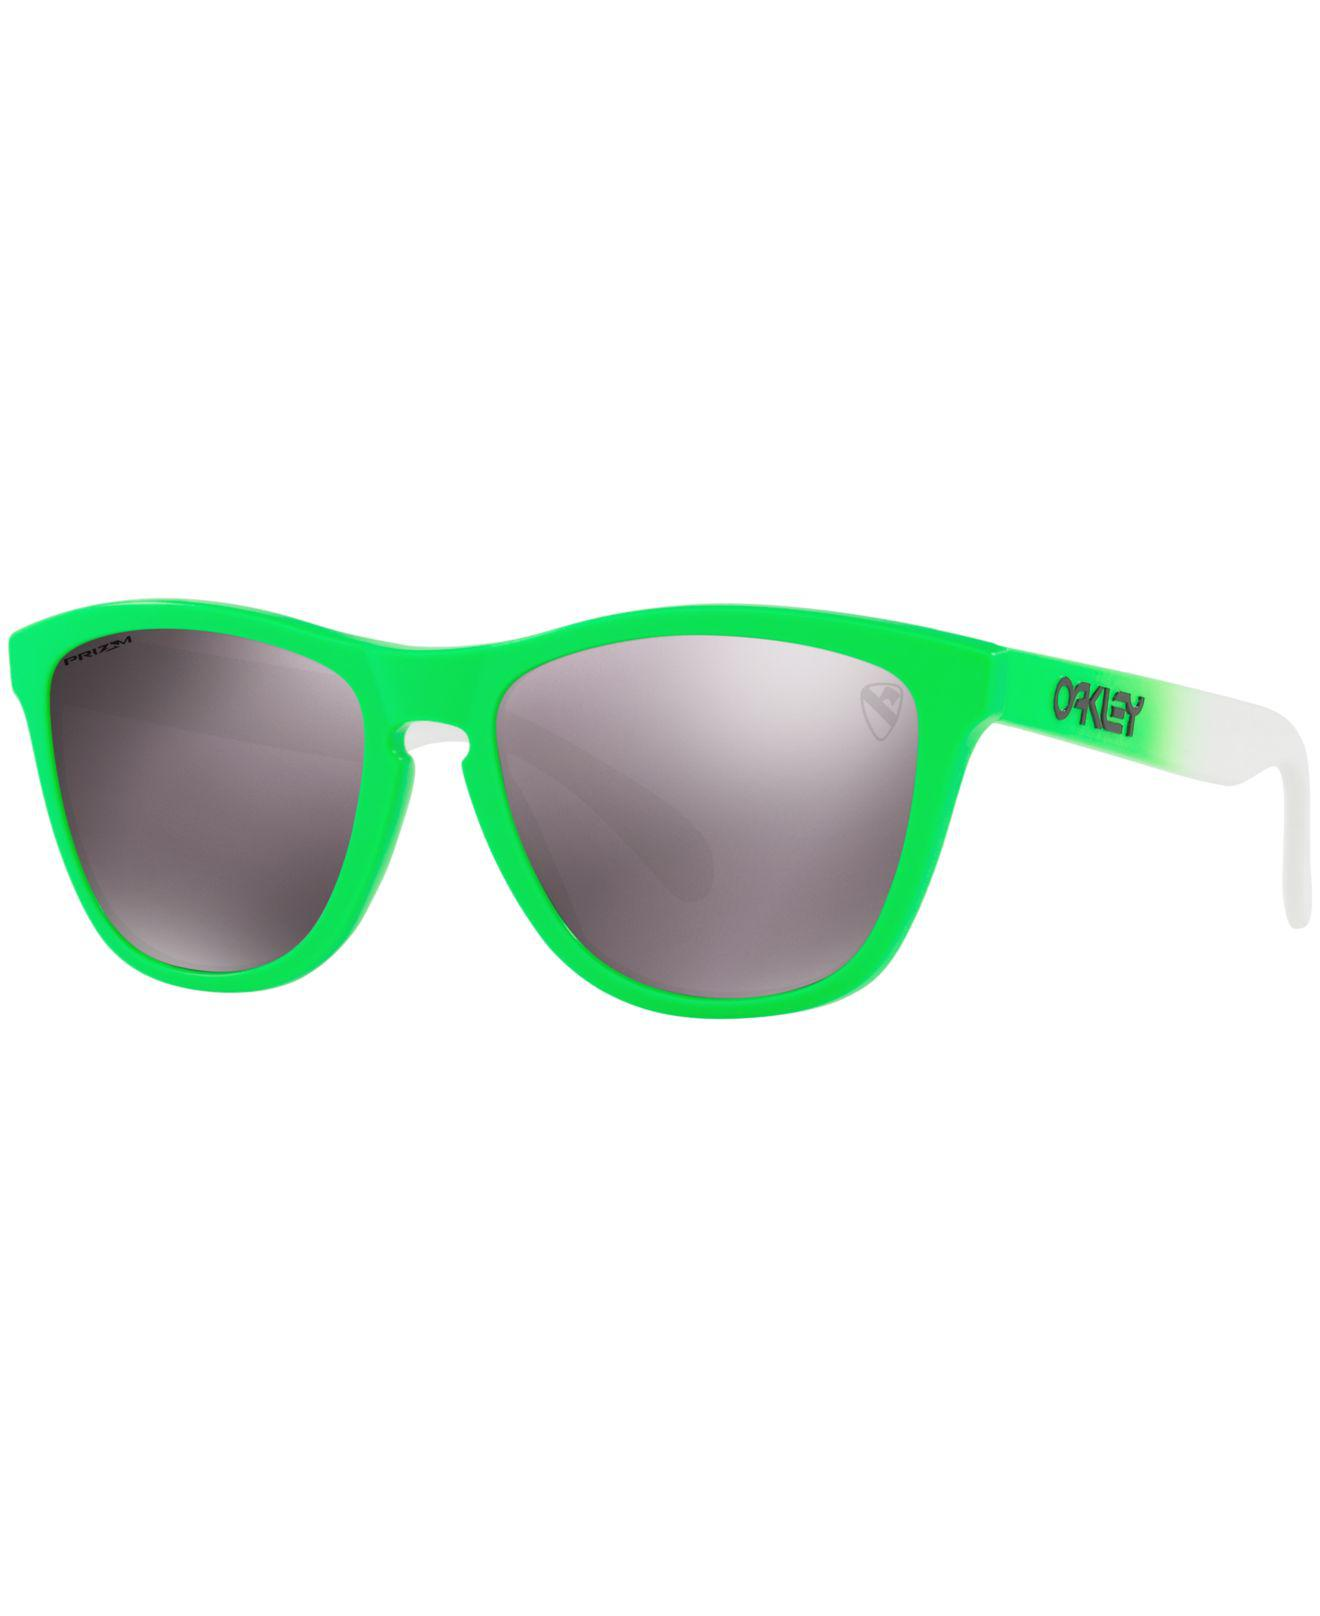 83d6e7091a Oakley. Women s Green Frogskin Prizm Sunglasses